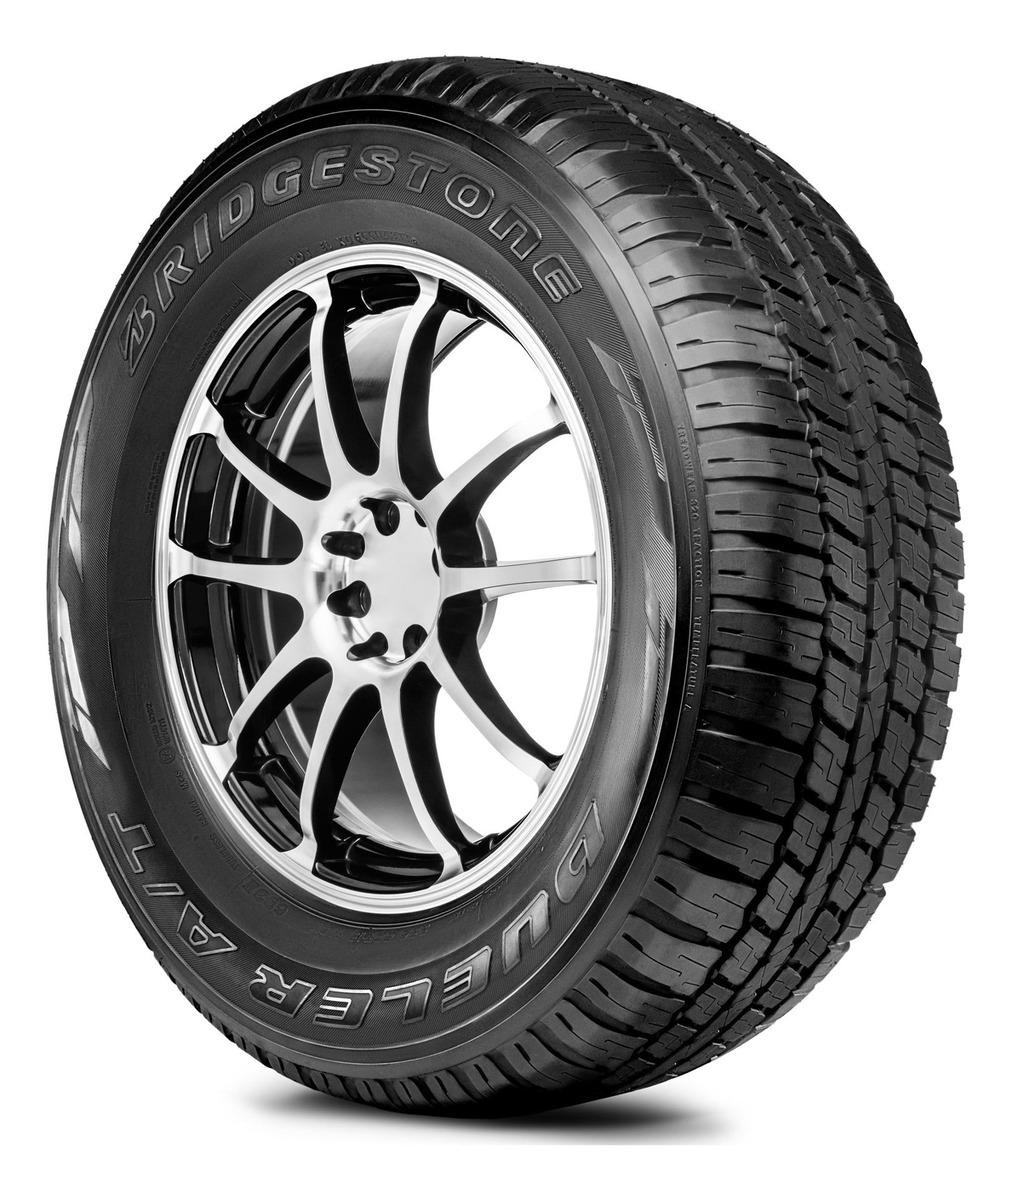 Neumático 265/65R17 112S DUELER A/T 693 III BRIDGESTONE